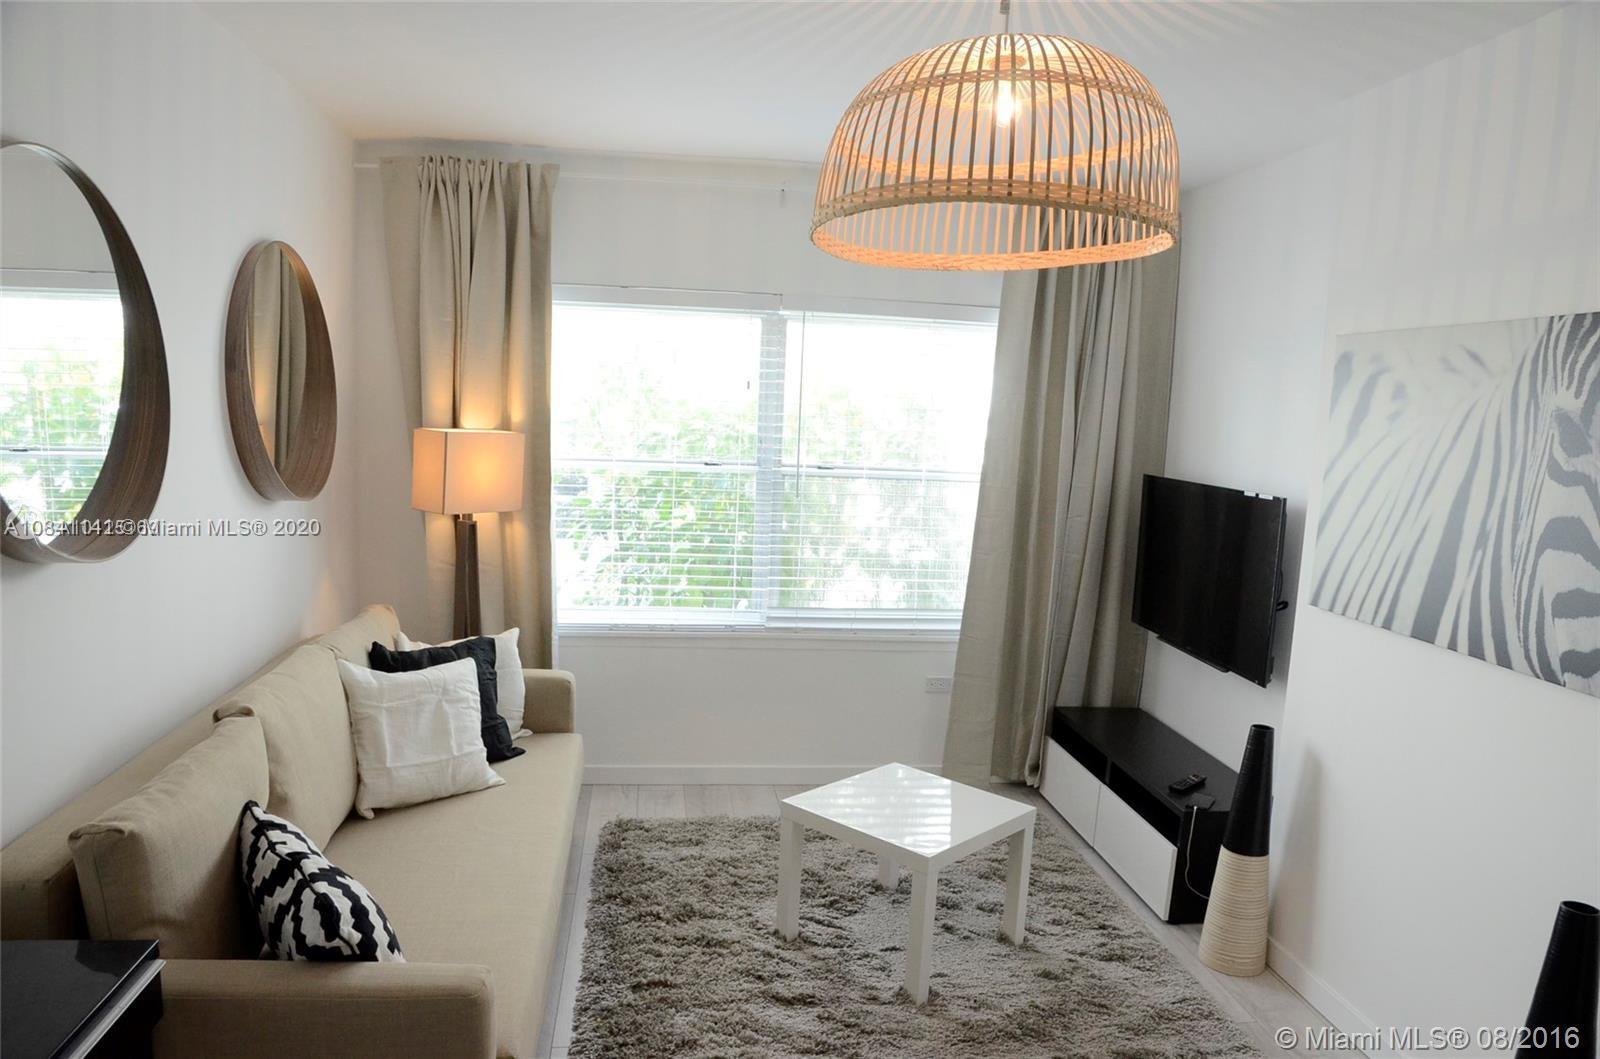 1555 Pennsylvania Ave # 206, Miami Beach, Florida 33139, 1 Bedroom Bedrooms, ,1 BathroomBathrooms,Residential,For Sale,1555 Pennsylvania Ave # 206,A10841141